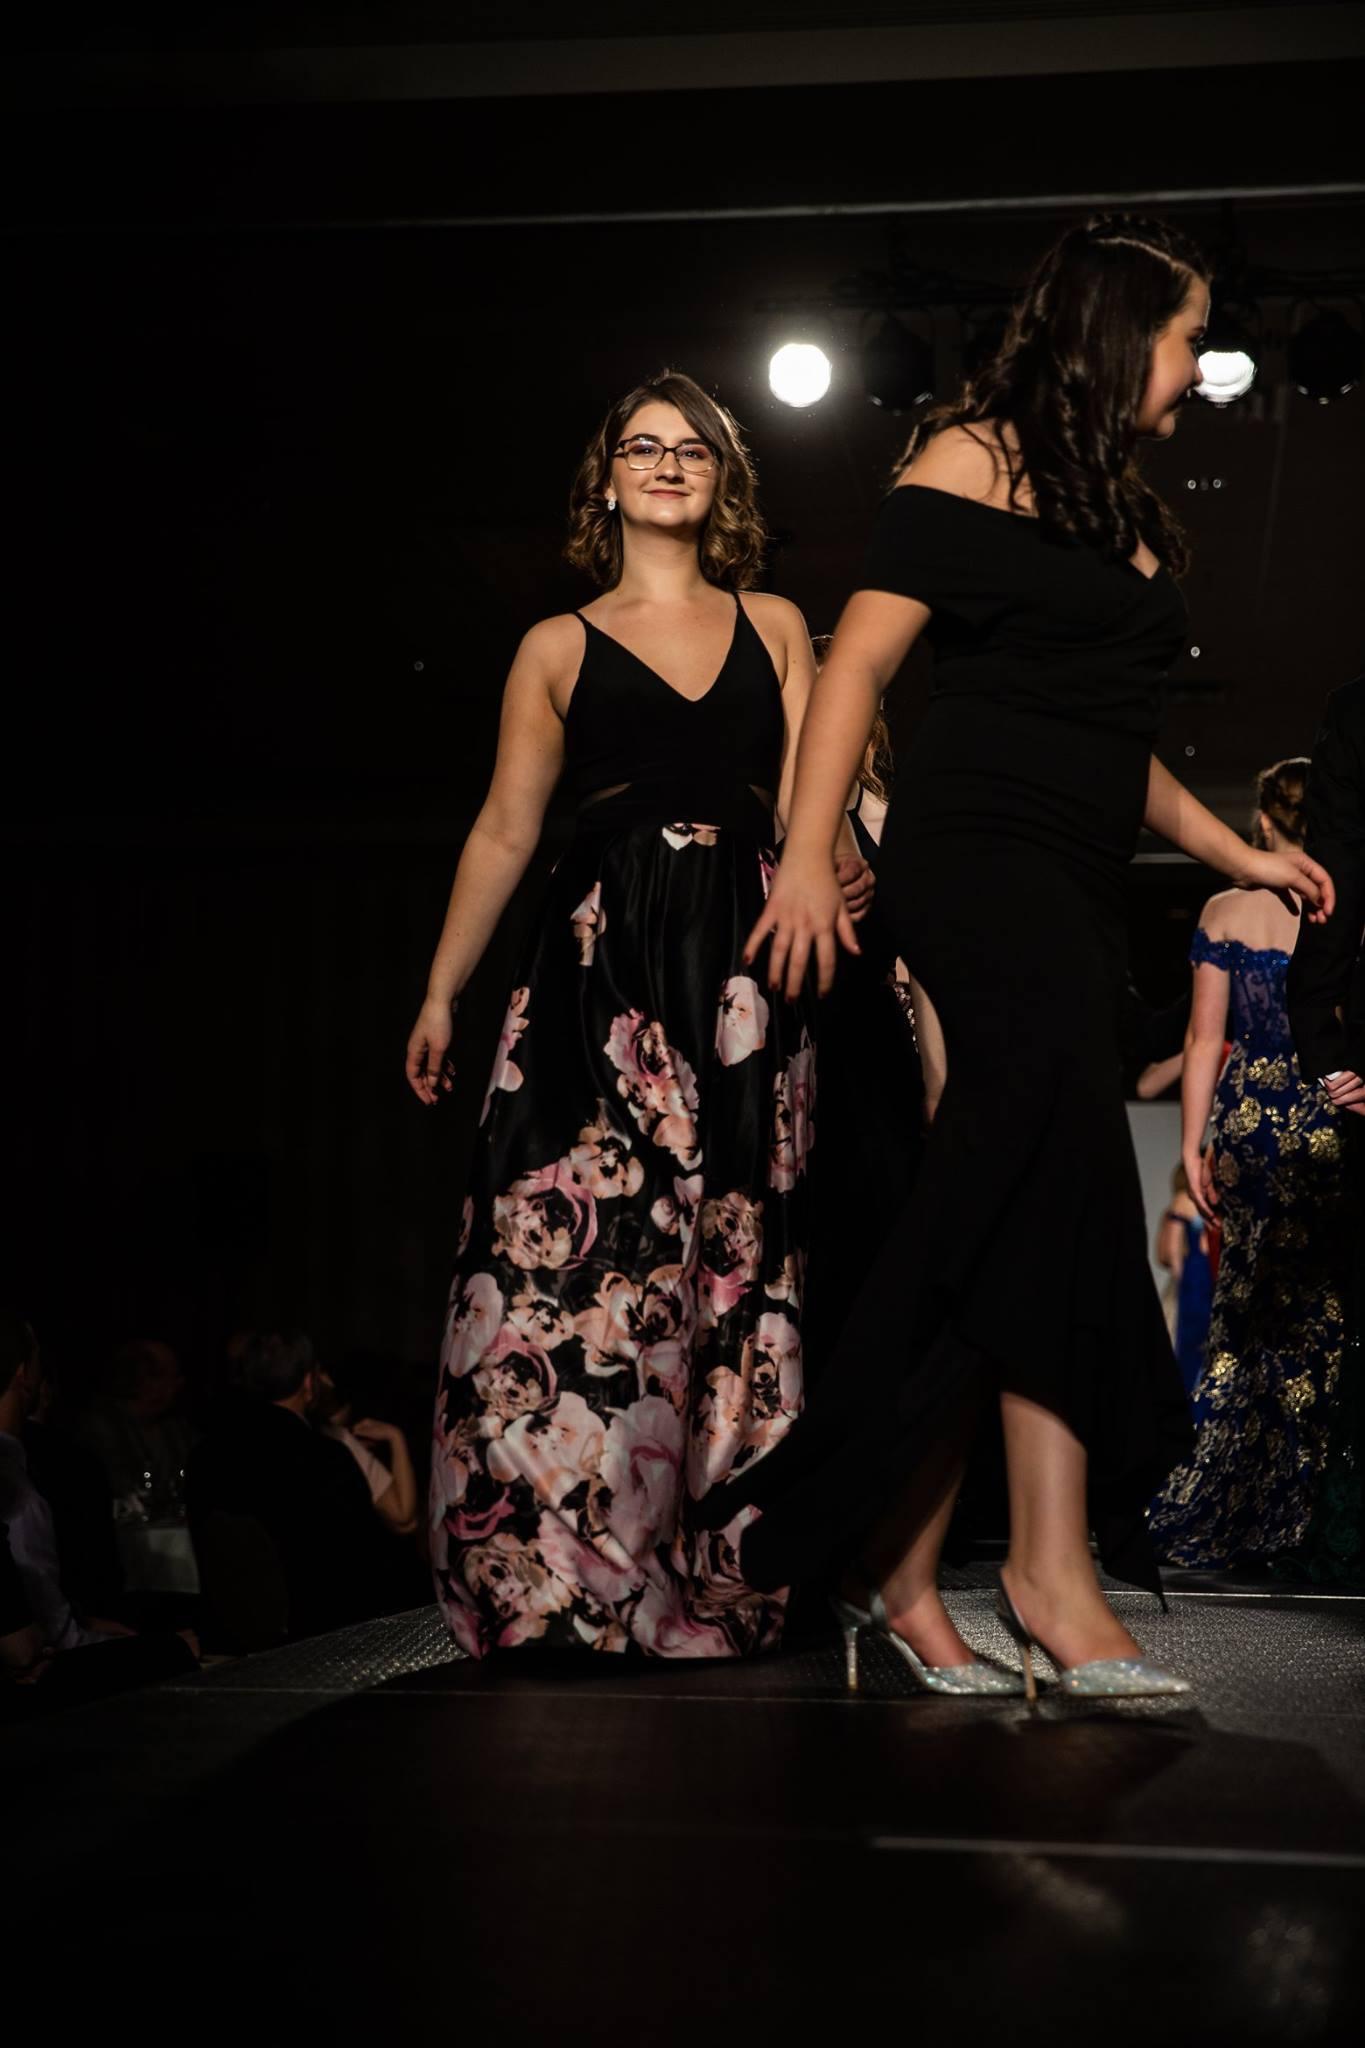 Lutheran_North_High_School_Macomb_Michigan_LHN_Fashion_Show_2019_Seniors (43).jpg